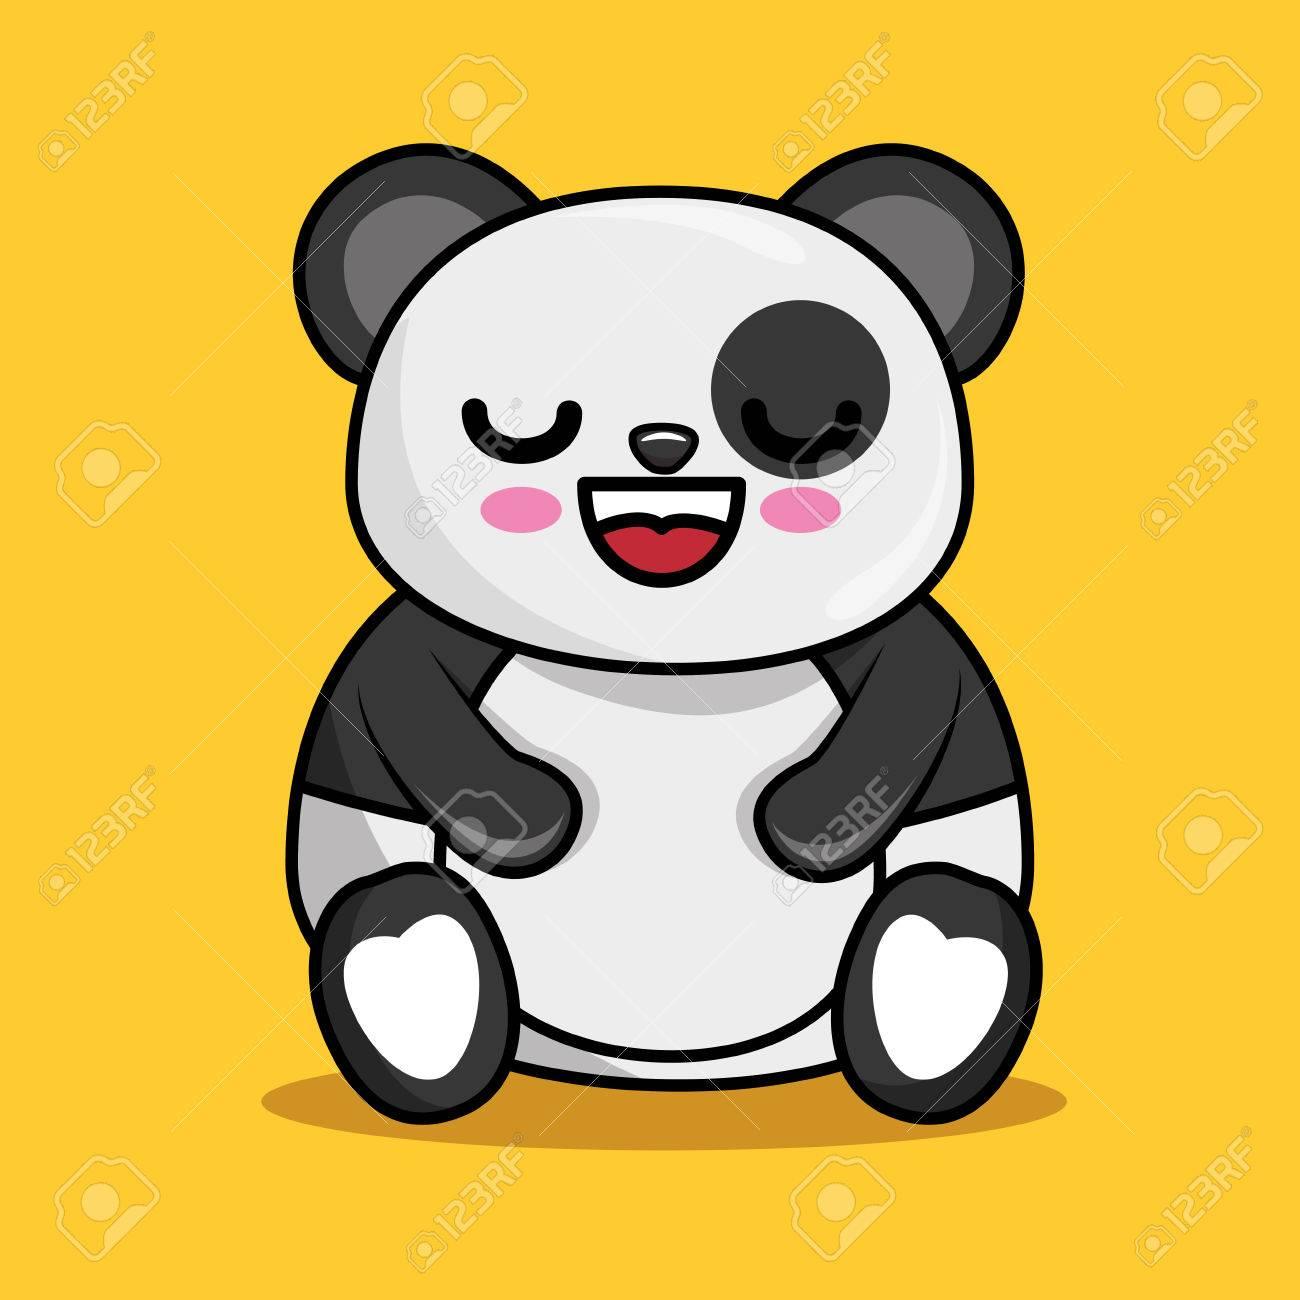 101de3f0ddd591 cute panda character kawaii style vector illustration design Stock Vector -  74687088